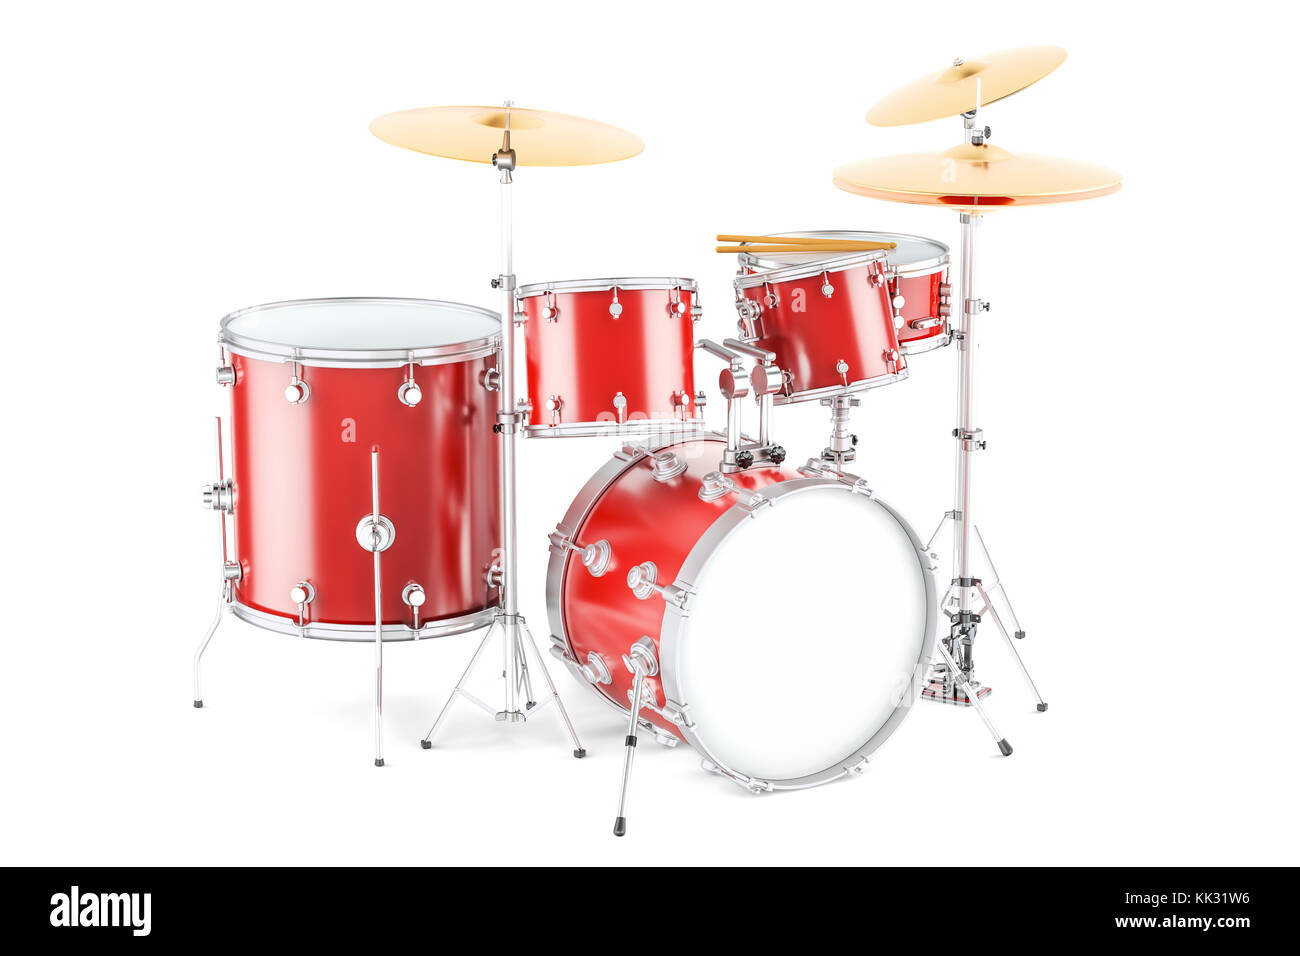 Cymbals Isolated Stockfotos & Cymbals Isolated Bilder - Alamy